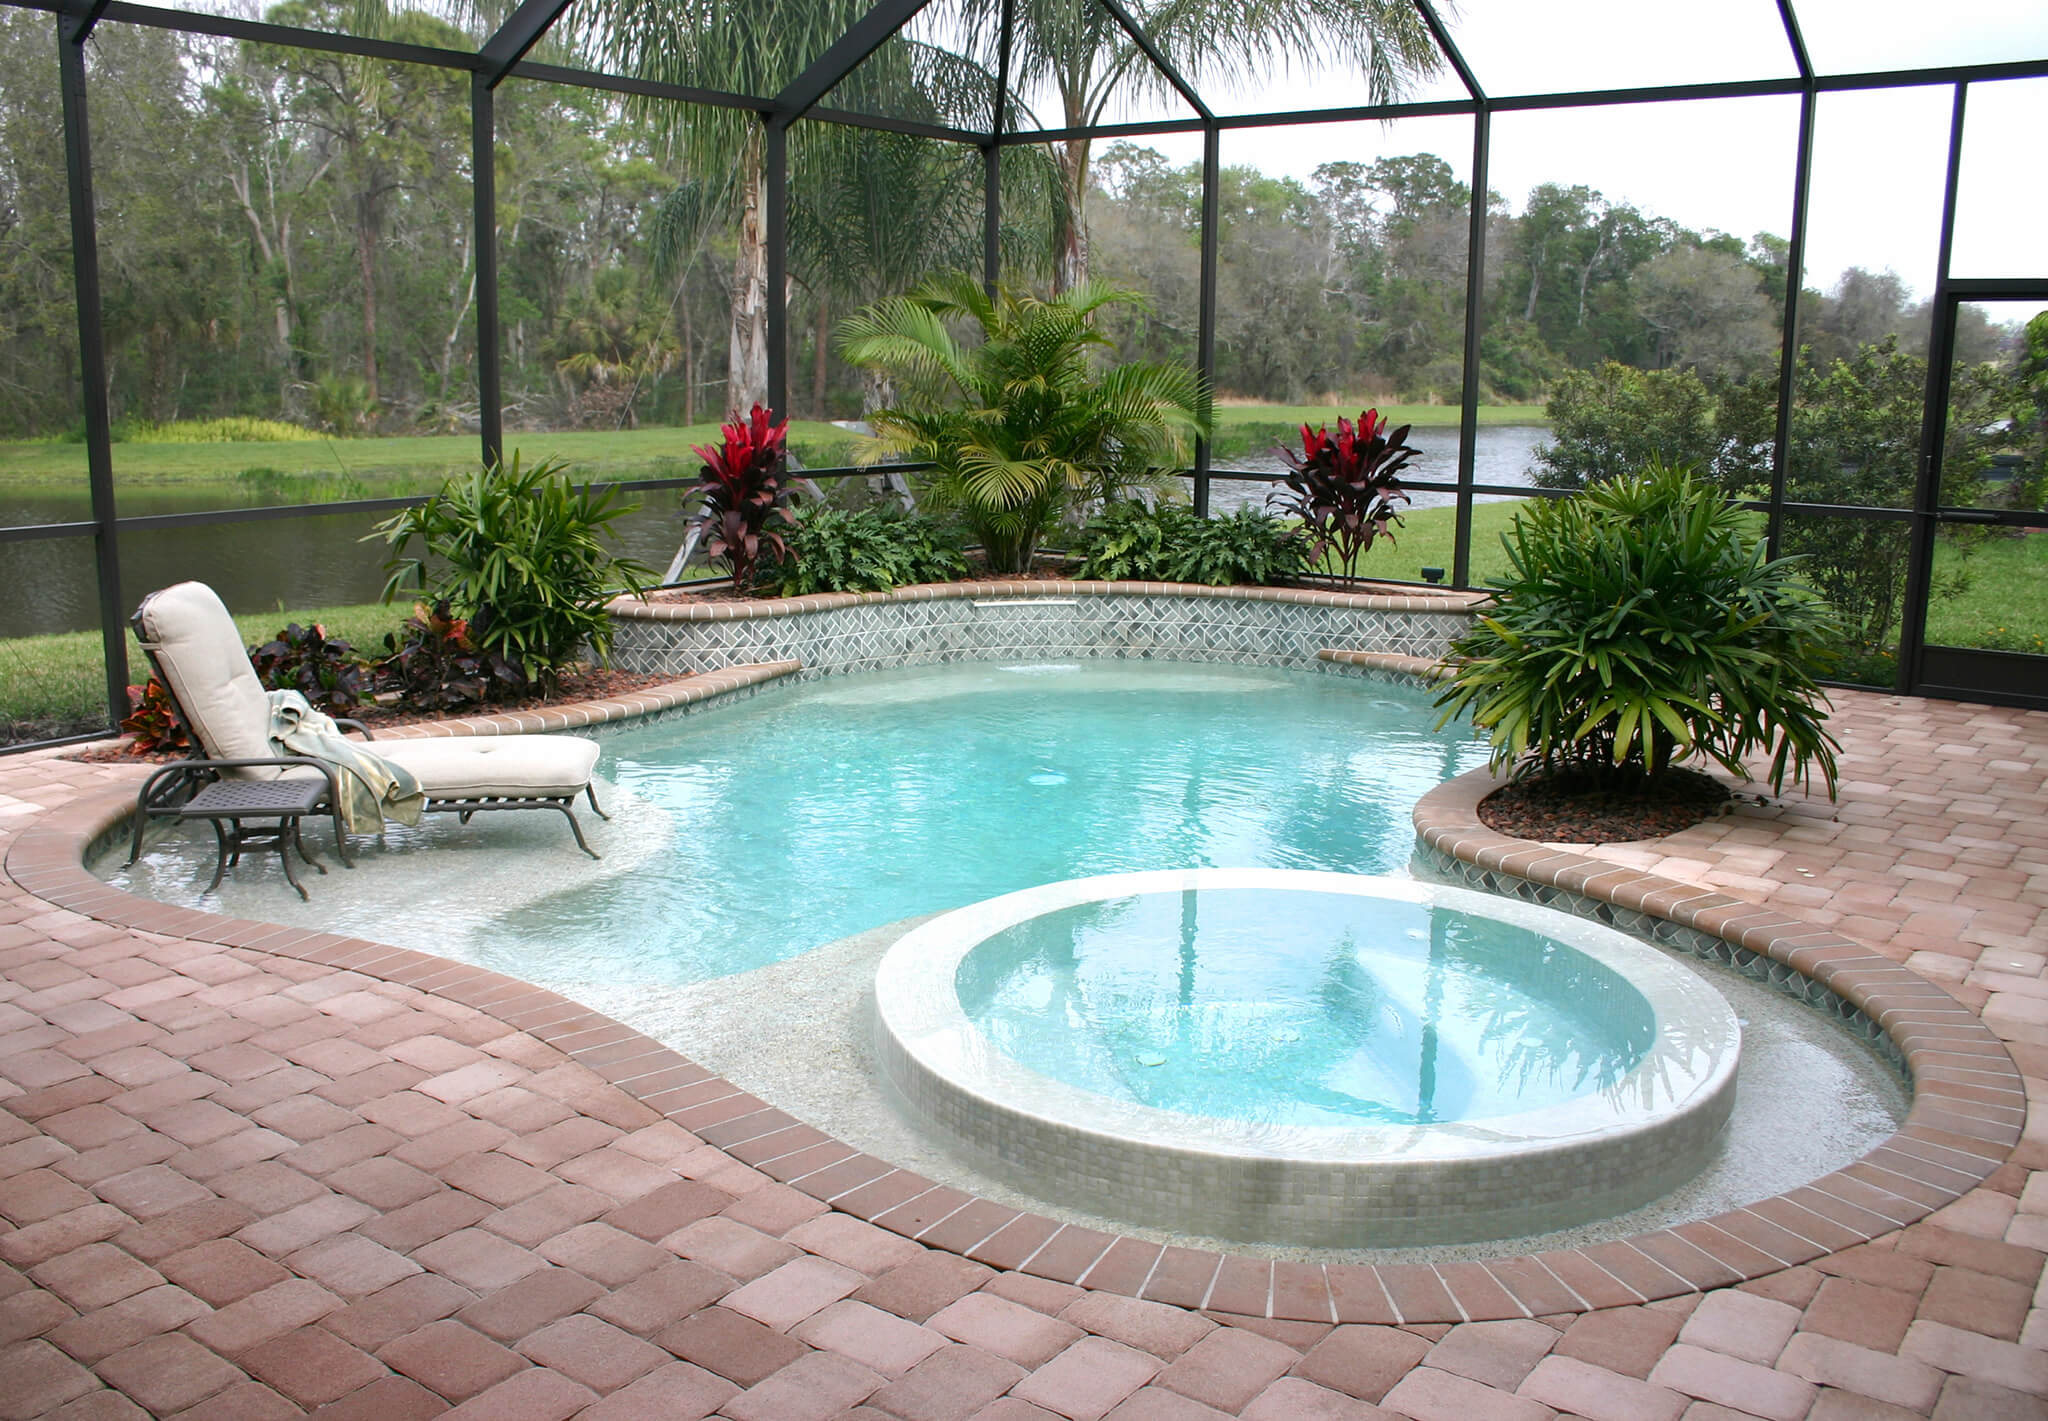 Paver Pool Deck Design & Installation in Bluffton & Hilton ... on Pool Deck Patio Ideas  id=96685